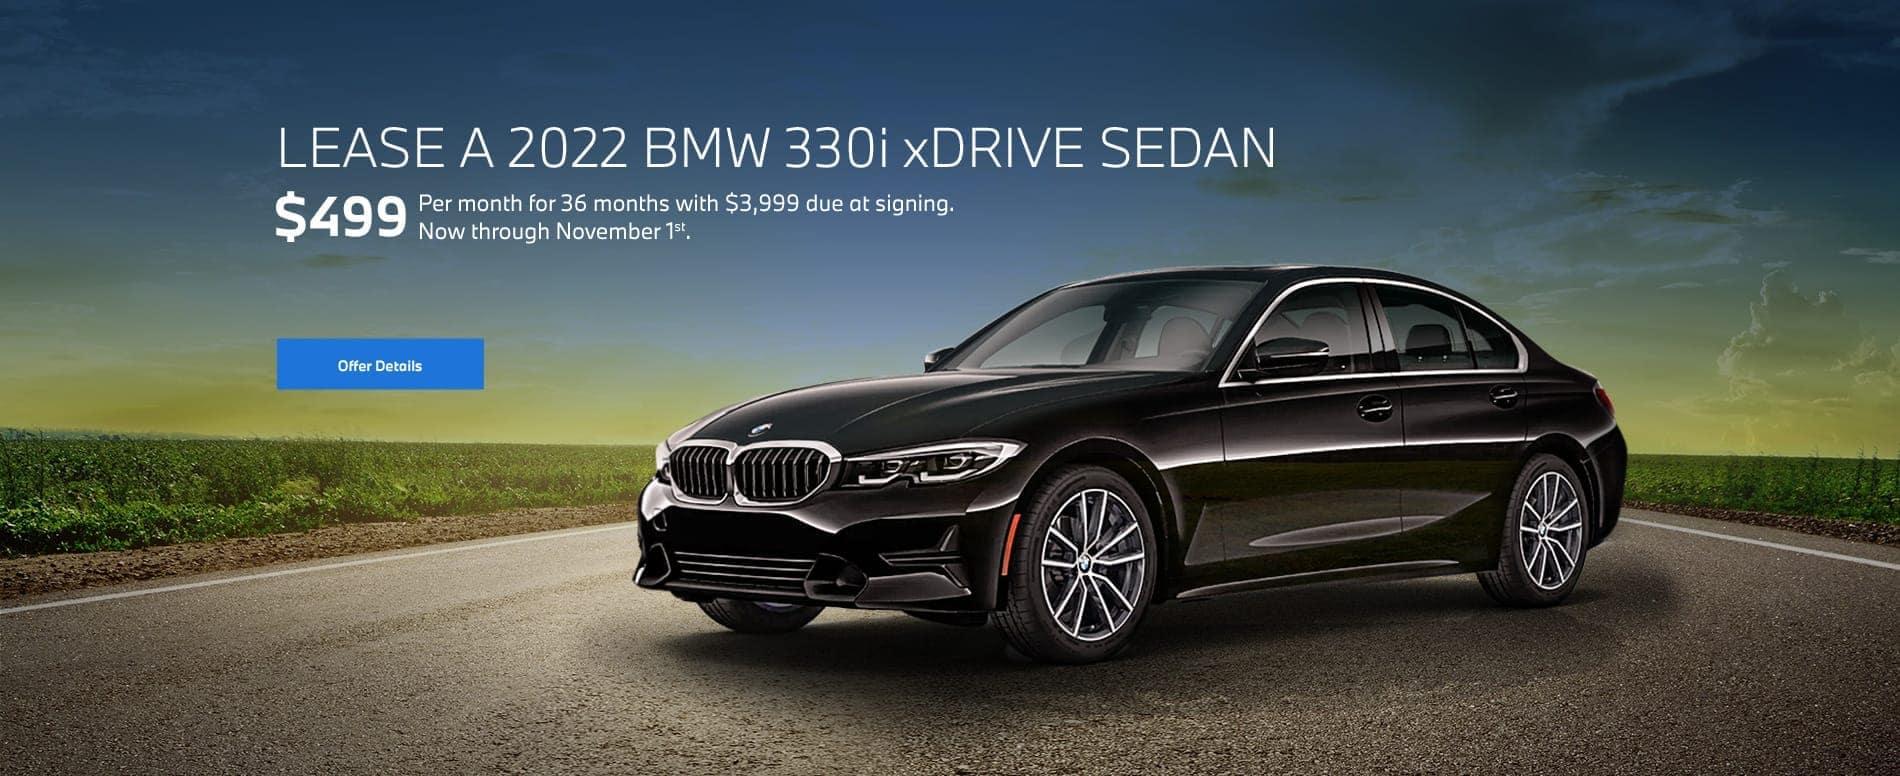 BMW_2022_330i_xDrive_Sedan_499_1900x776_Desktop